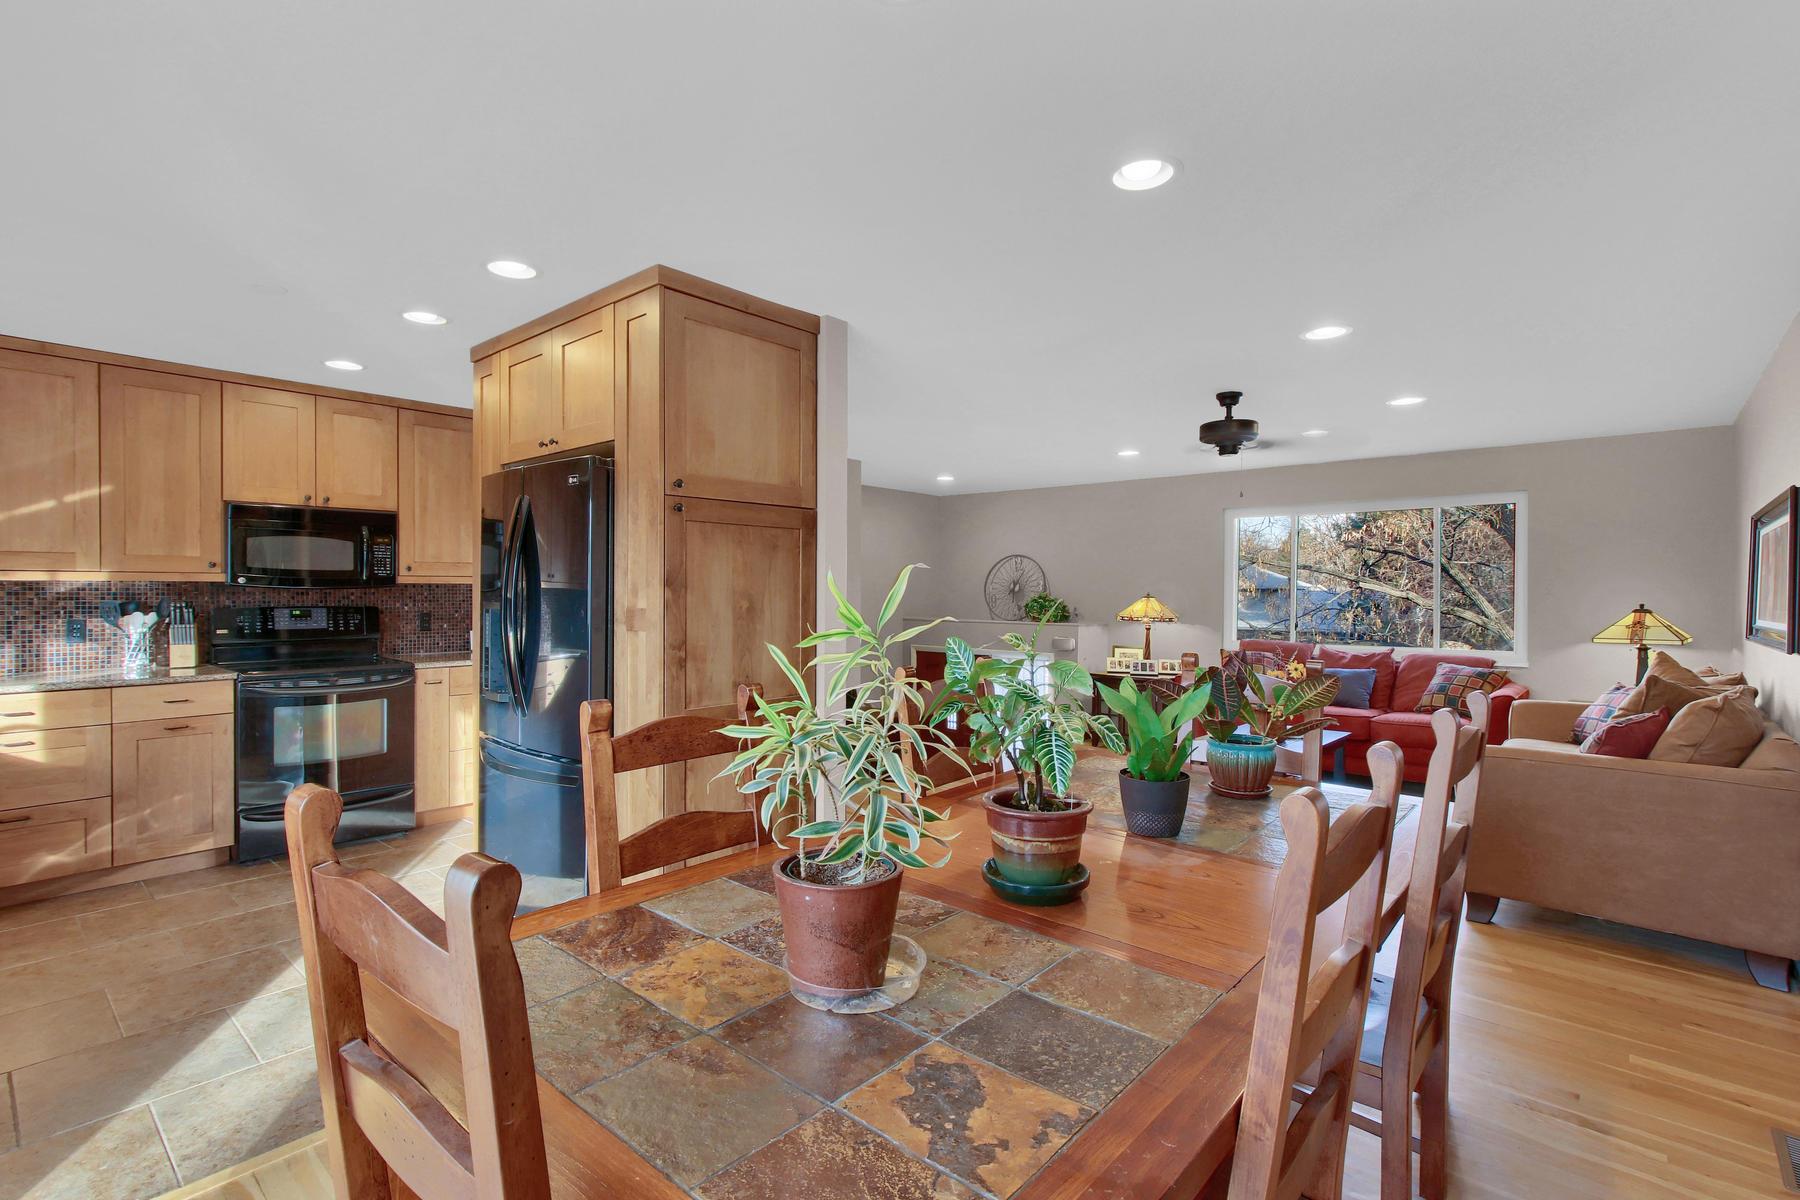 9375 Osceola St Westminster CO-012-14-Dining Room-MLS_Size.jpg